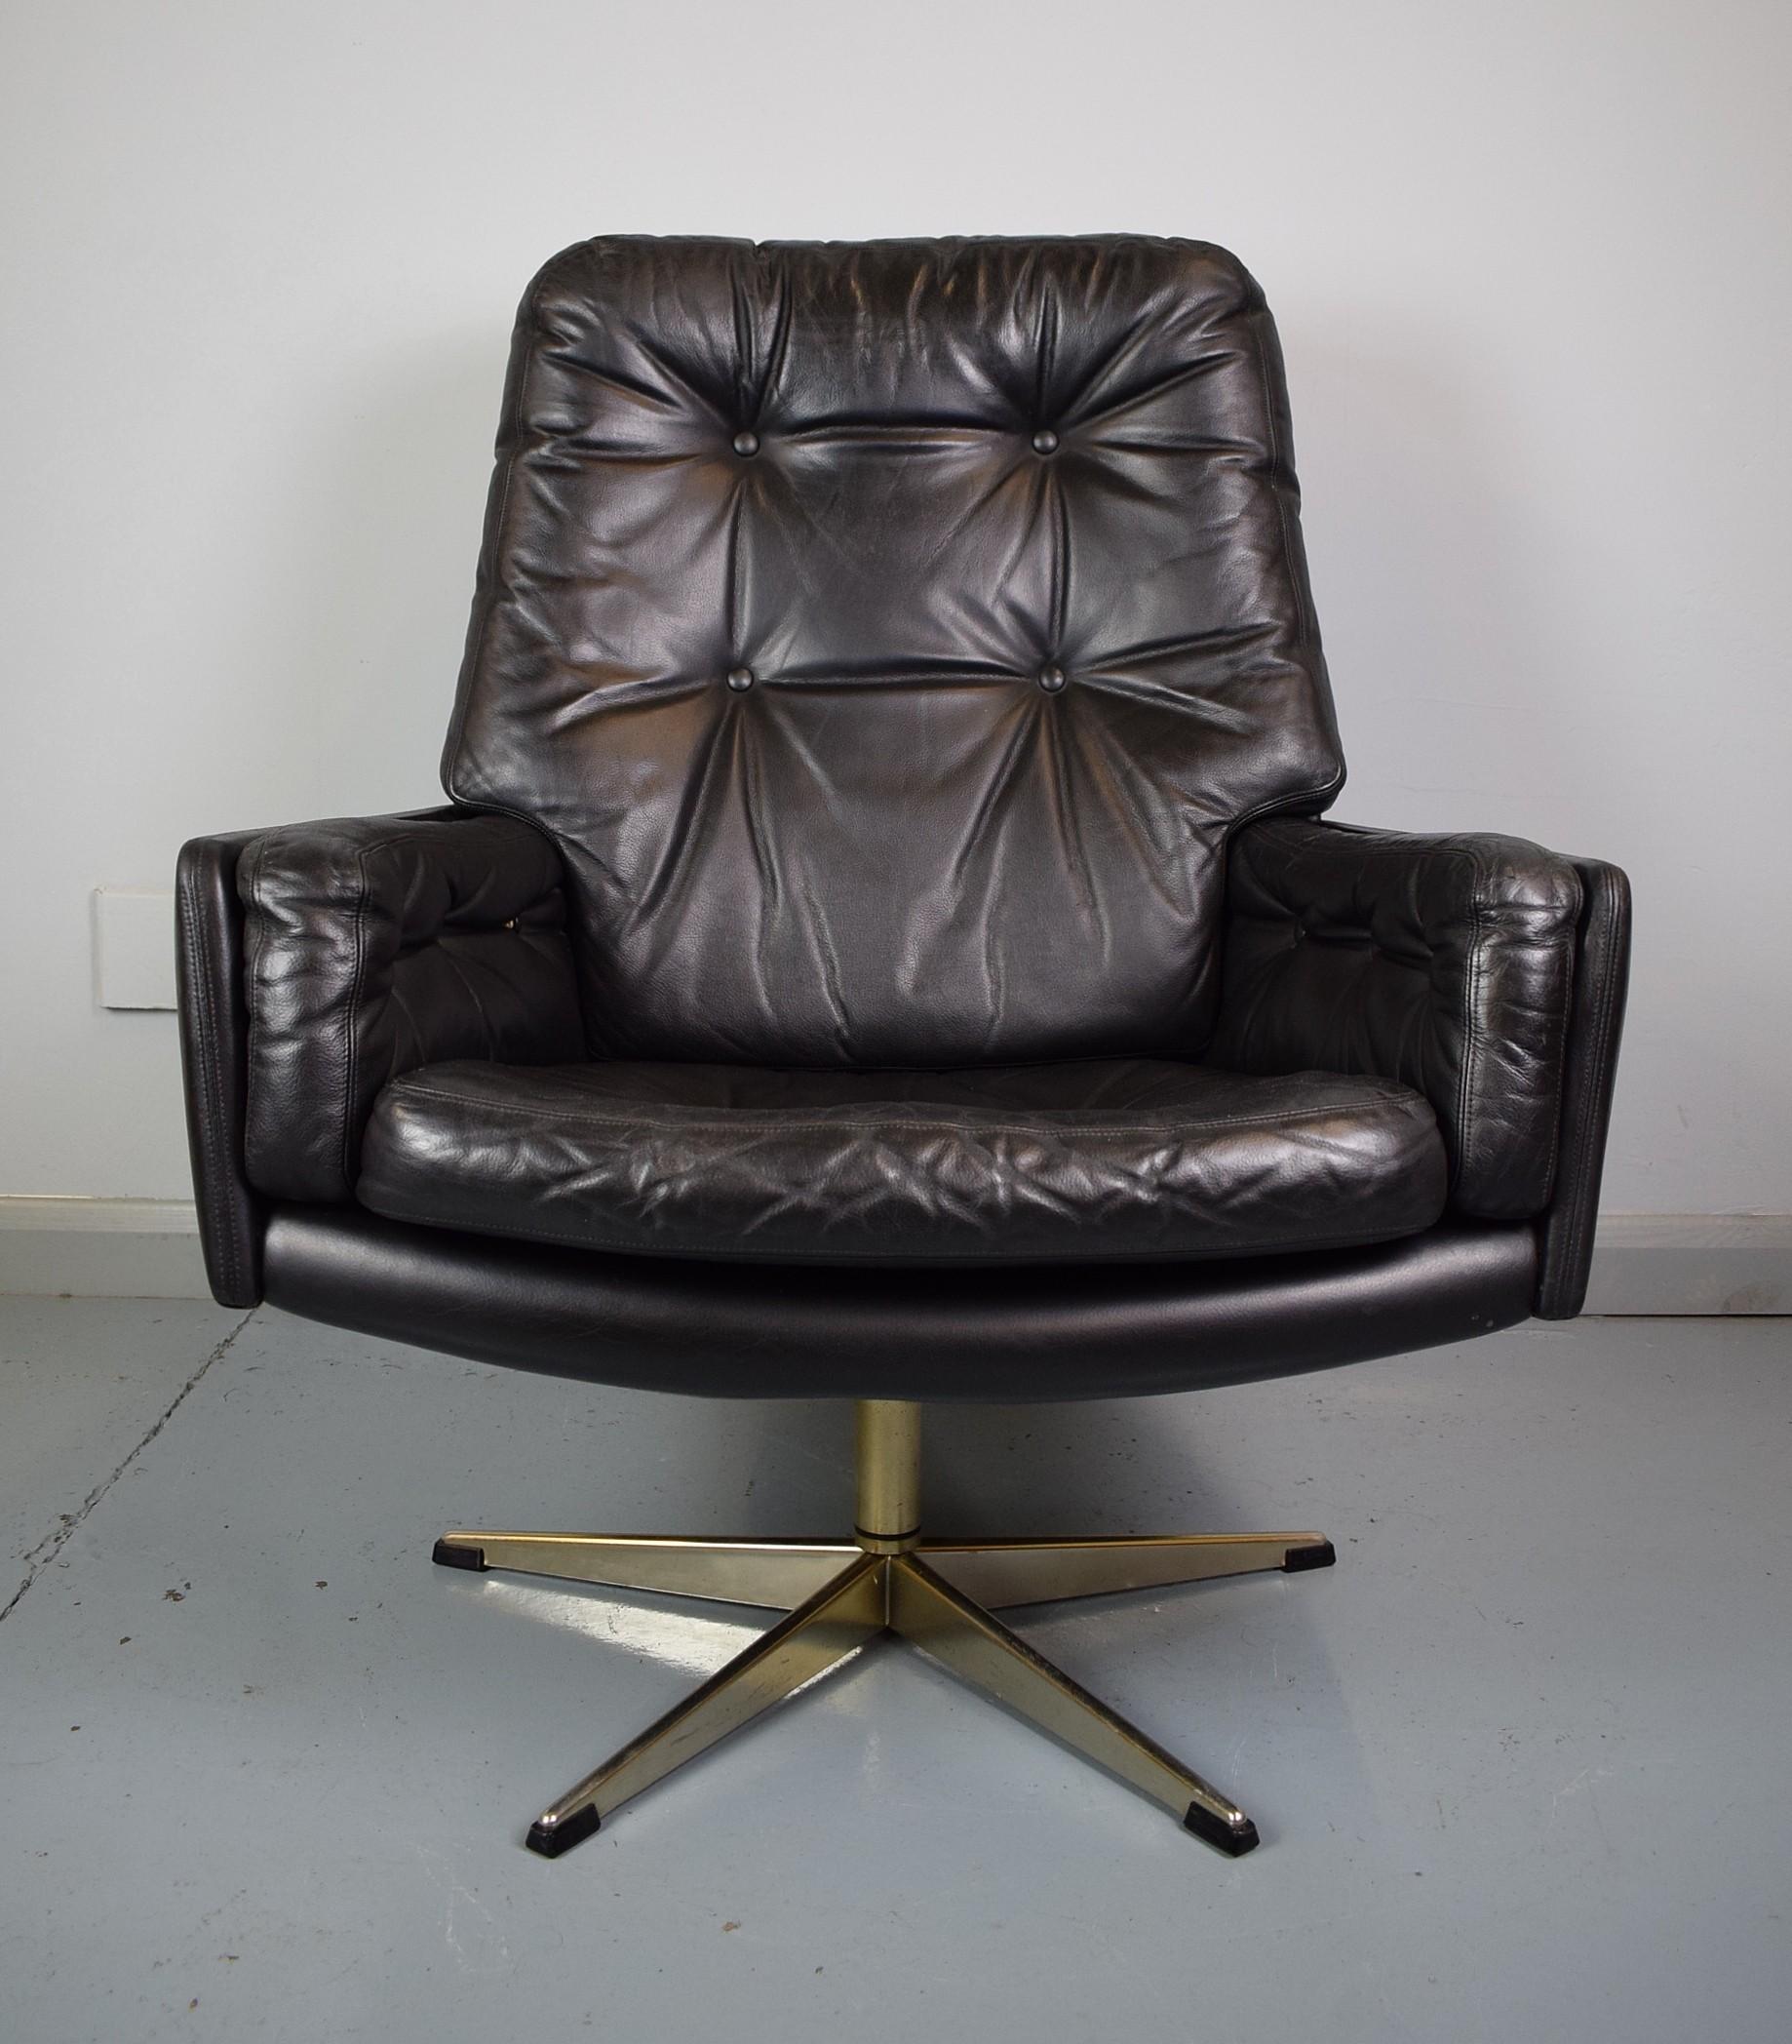 Vintage Danish Black Leather Swivel Armchair - 1960s ...